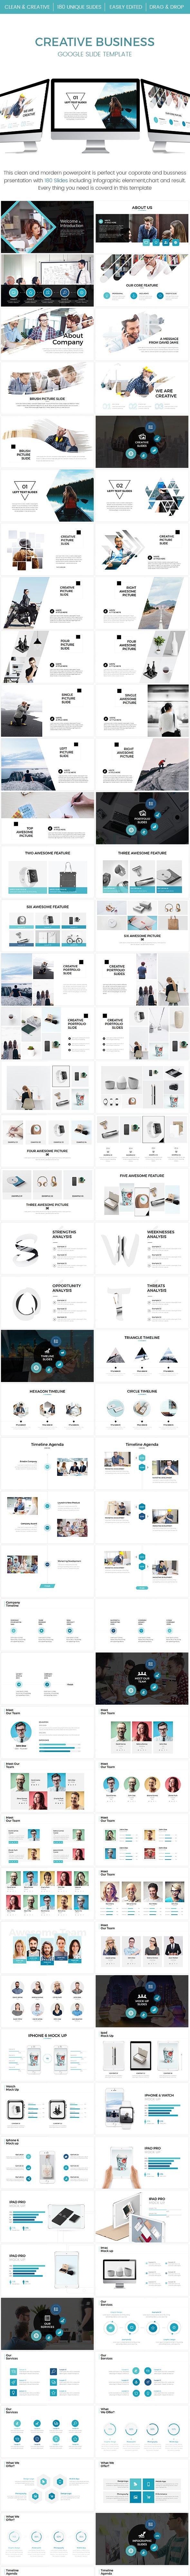 Creative Business Google Slide Template - Google Slides Presentation Templates